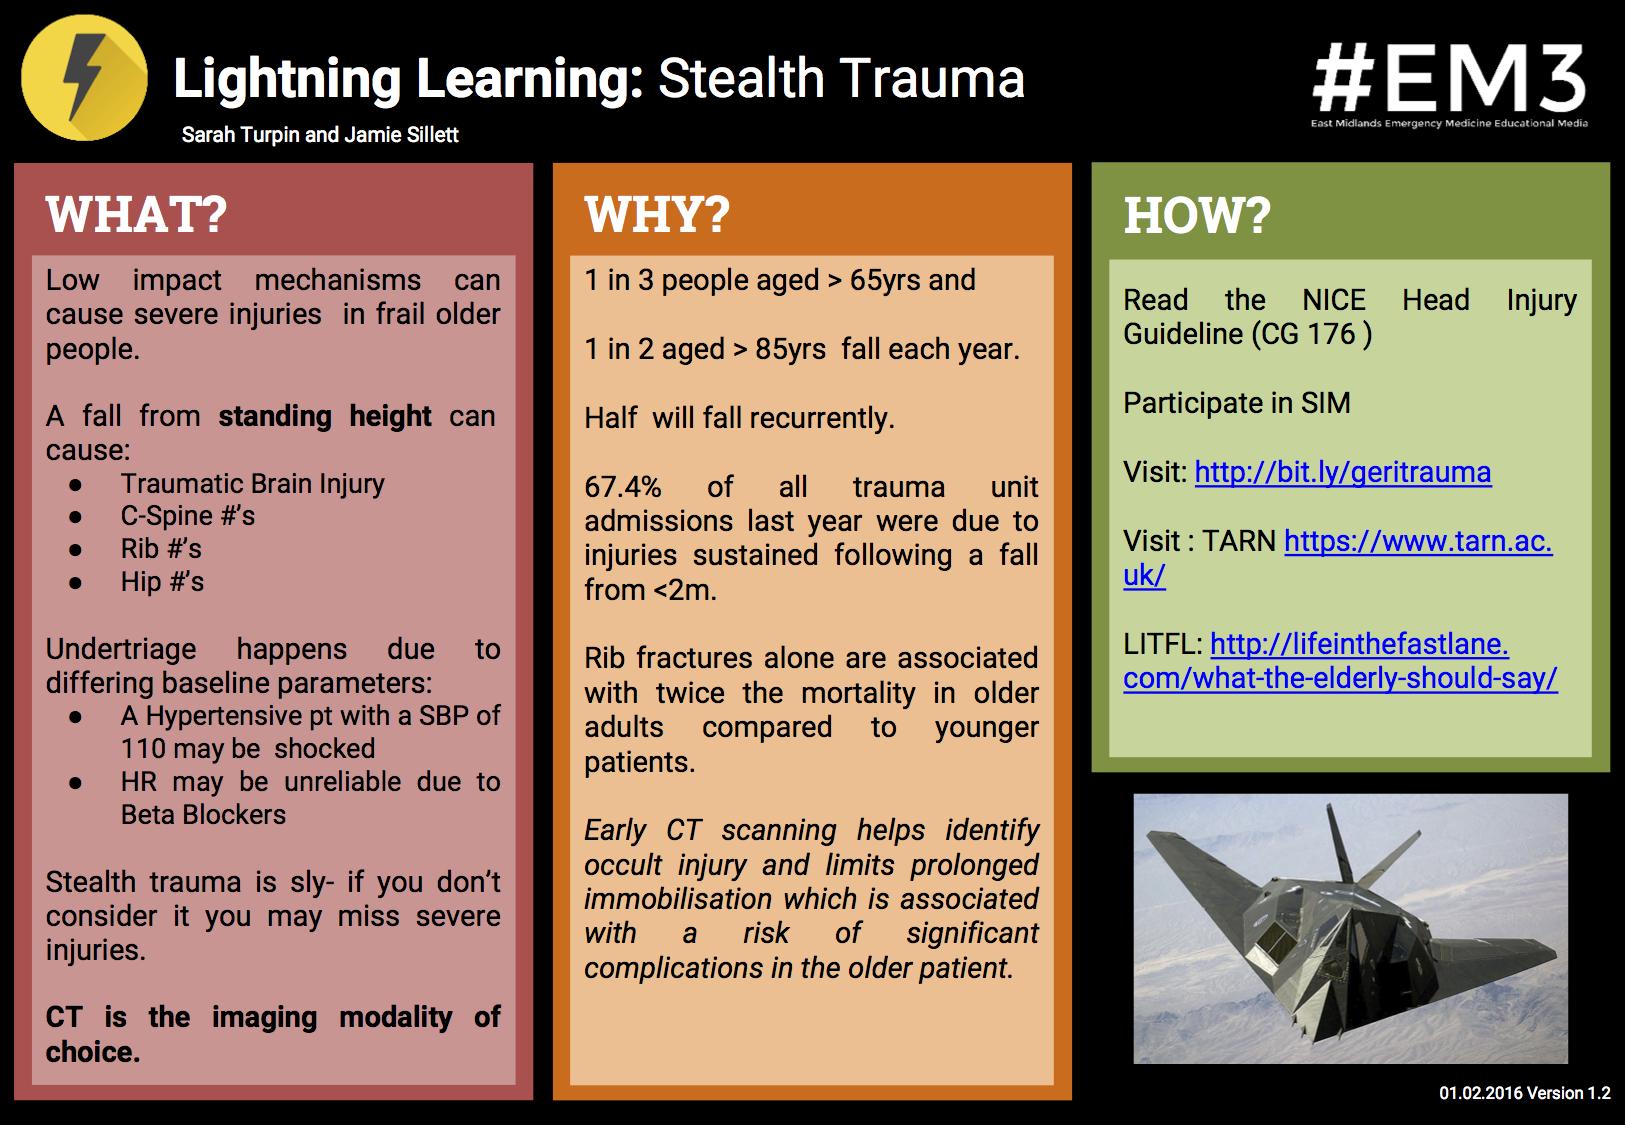 EM3-stealth-trauma-lightning-learning.png